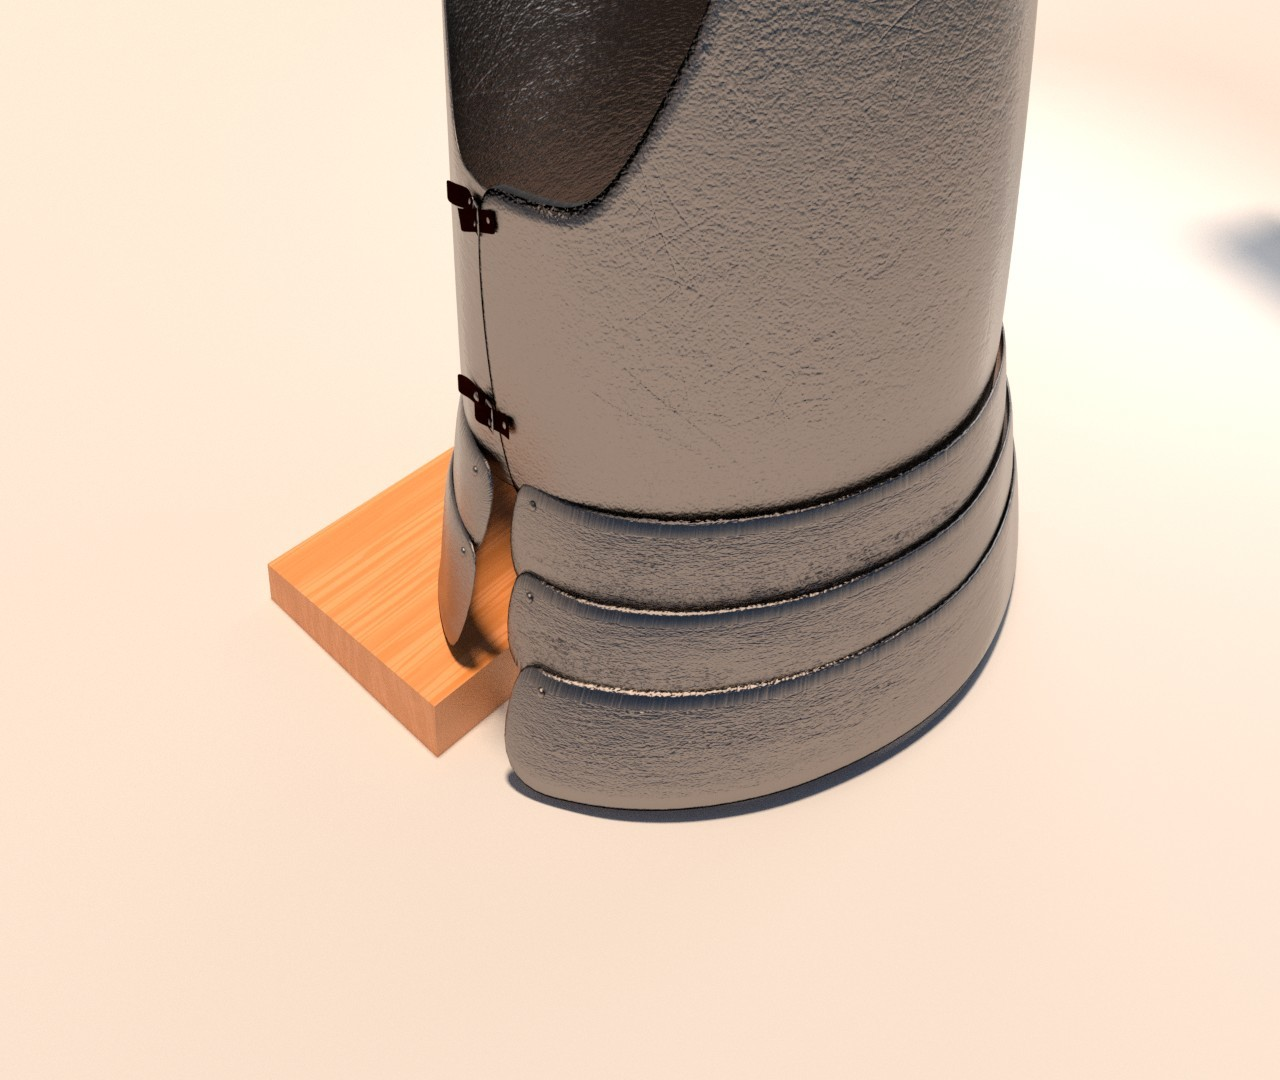 Cuirass 2 - Back view detail